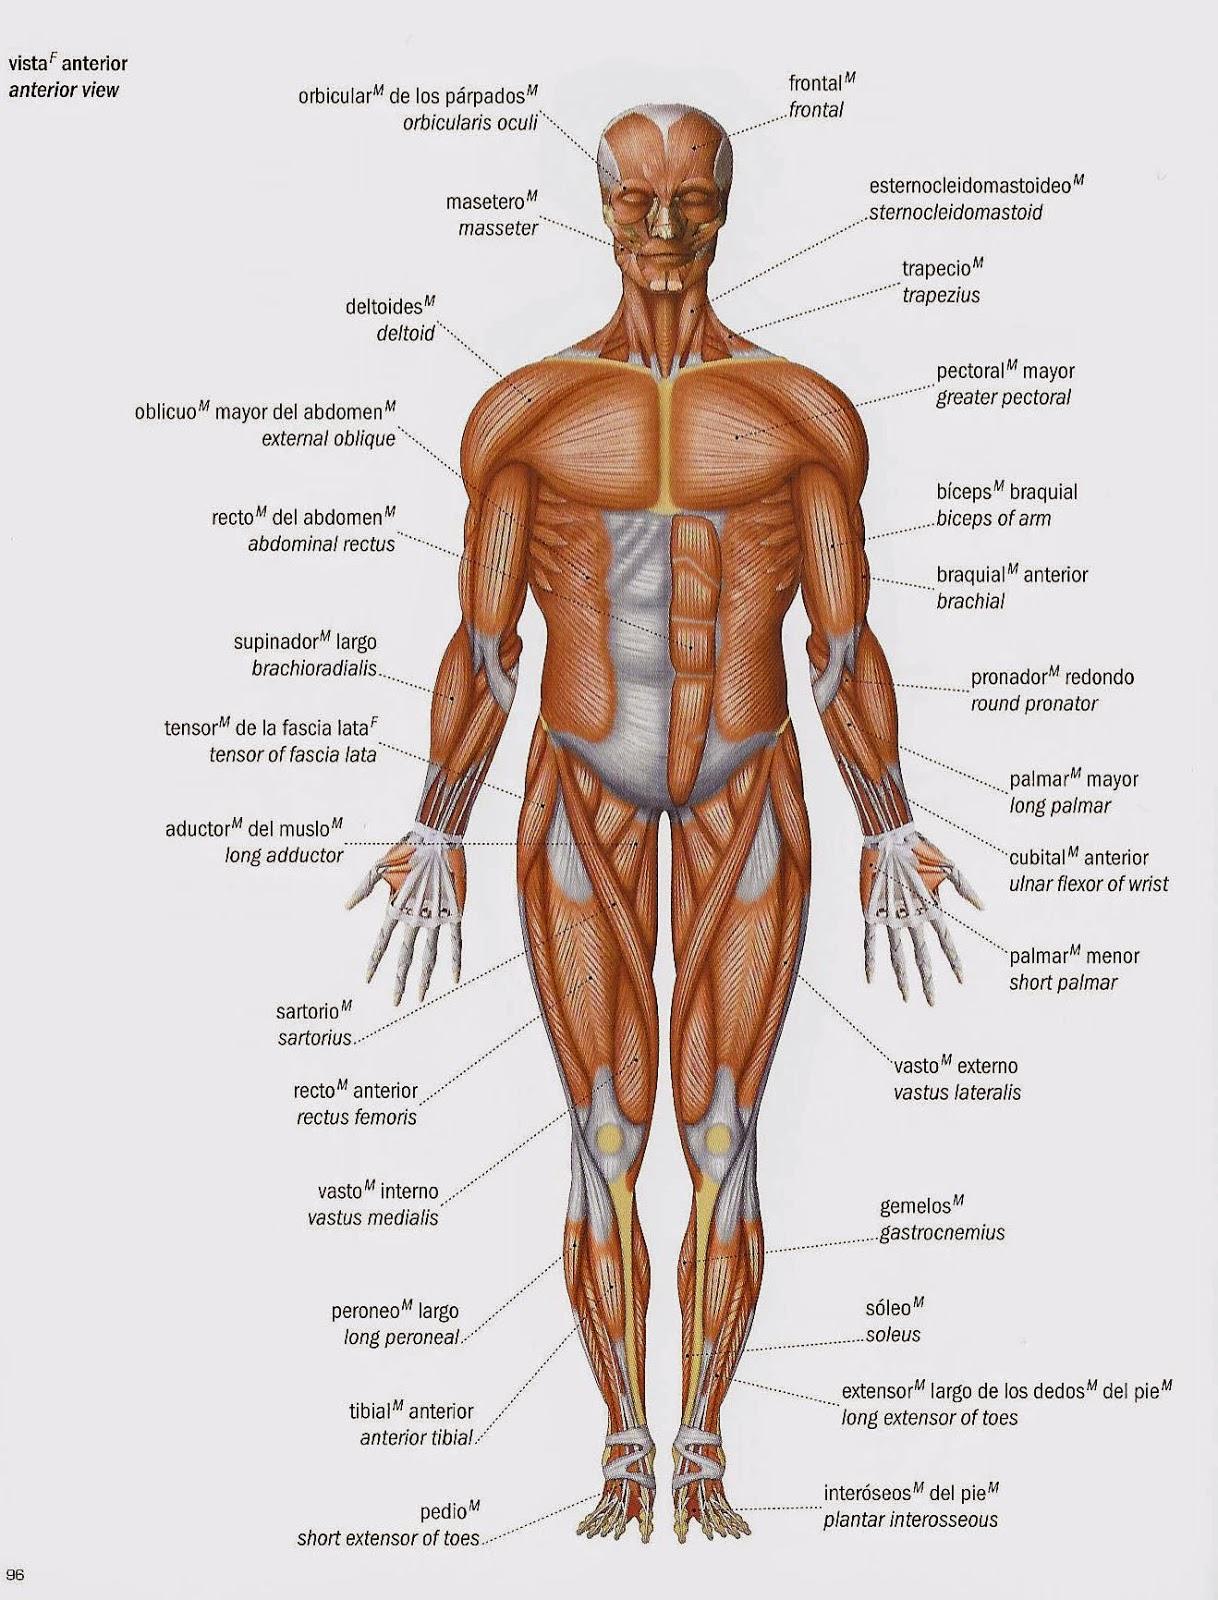 Famoso Anatomía Muscular Frente Viñeta - Imágenes de Anatomía Humana ...